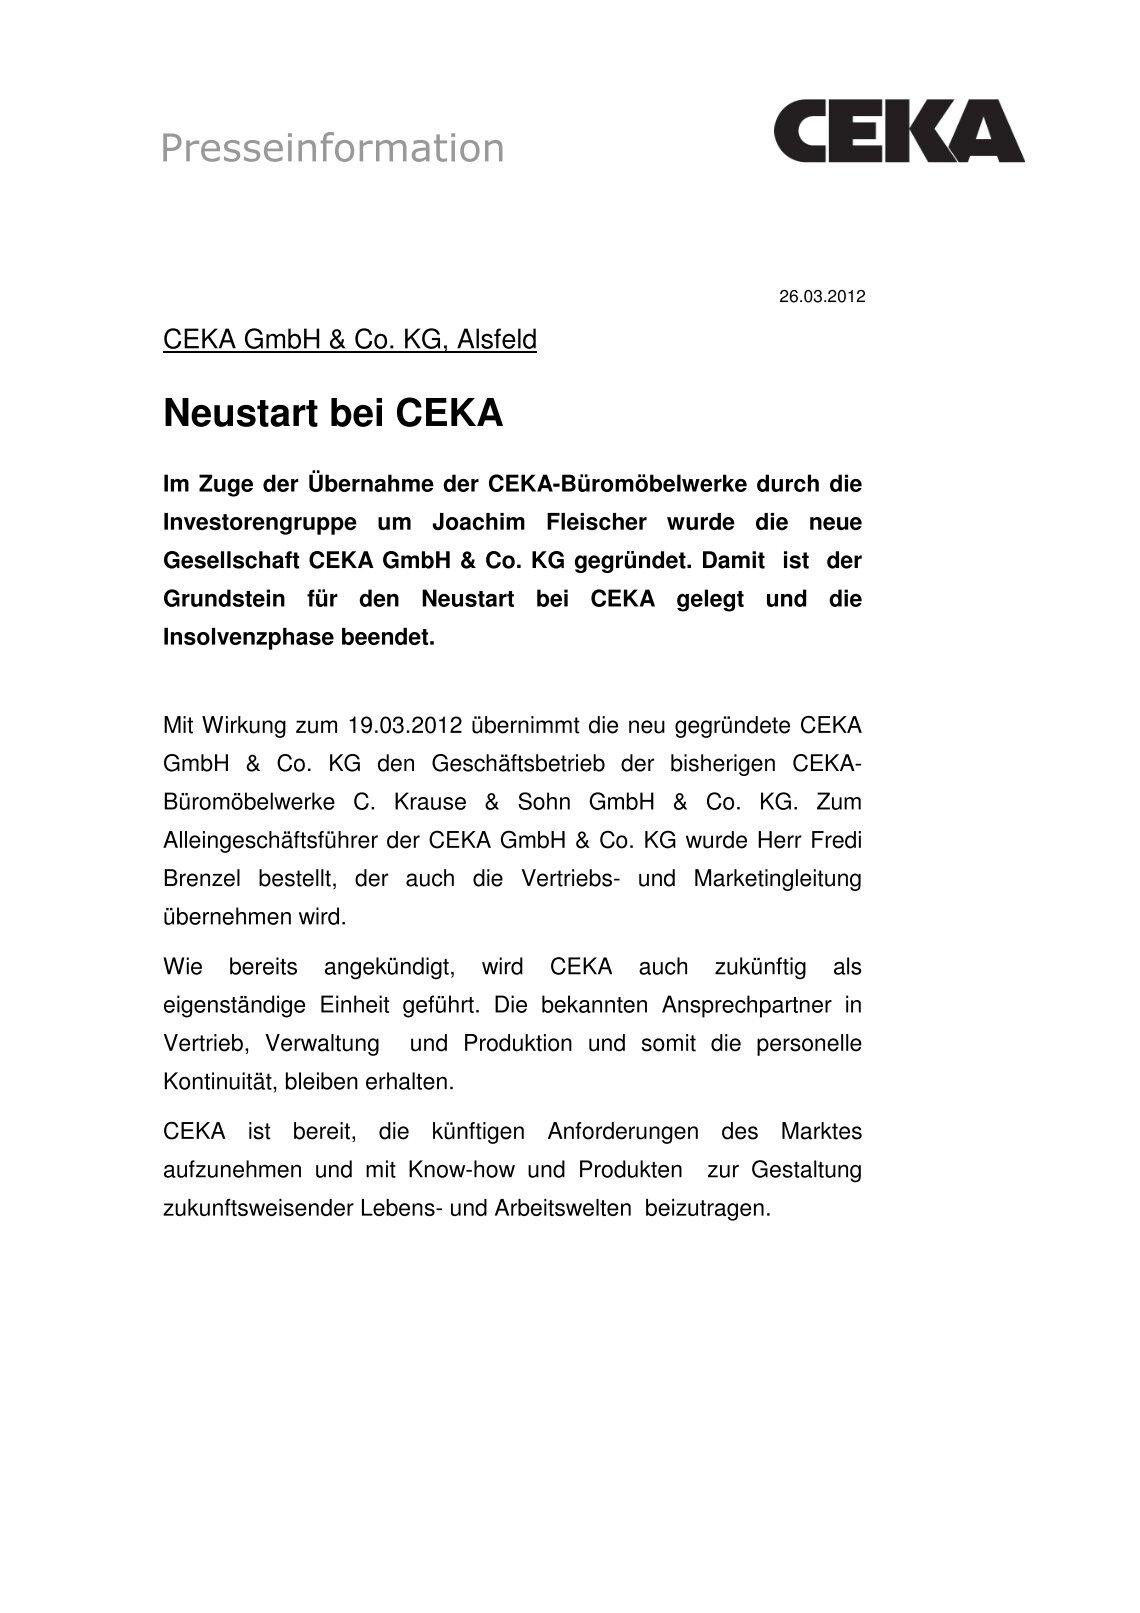 20 free Magazines from CEKA.DE